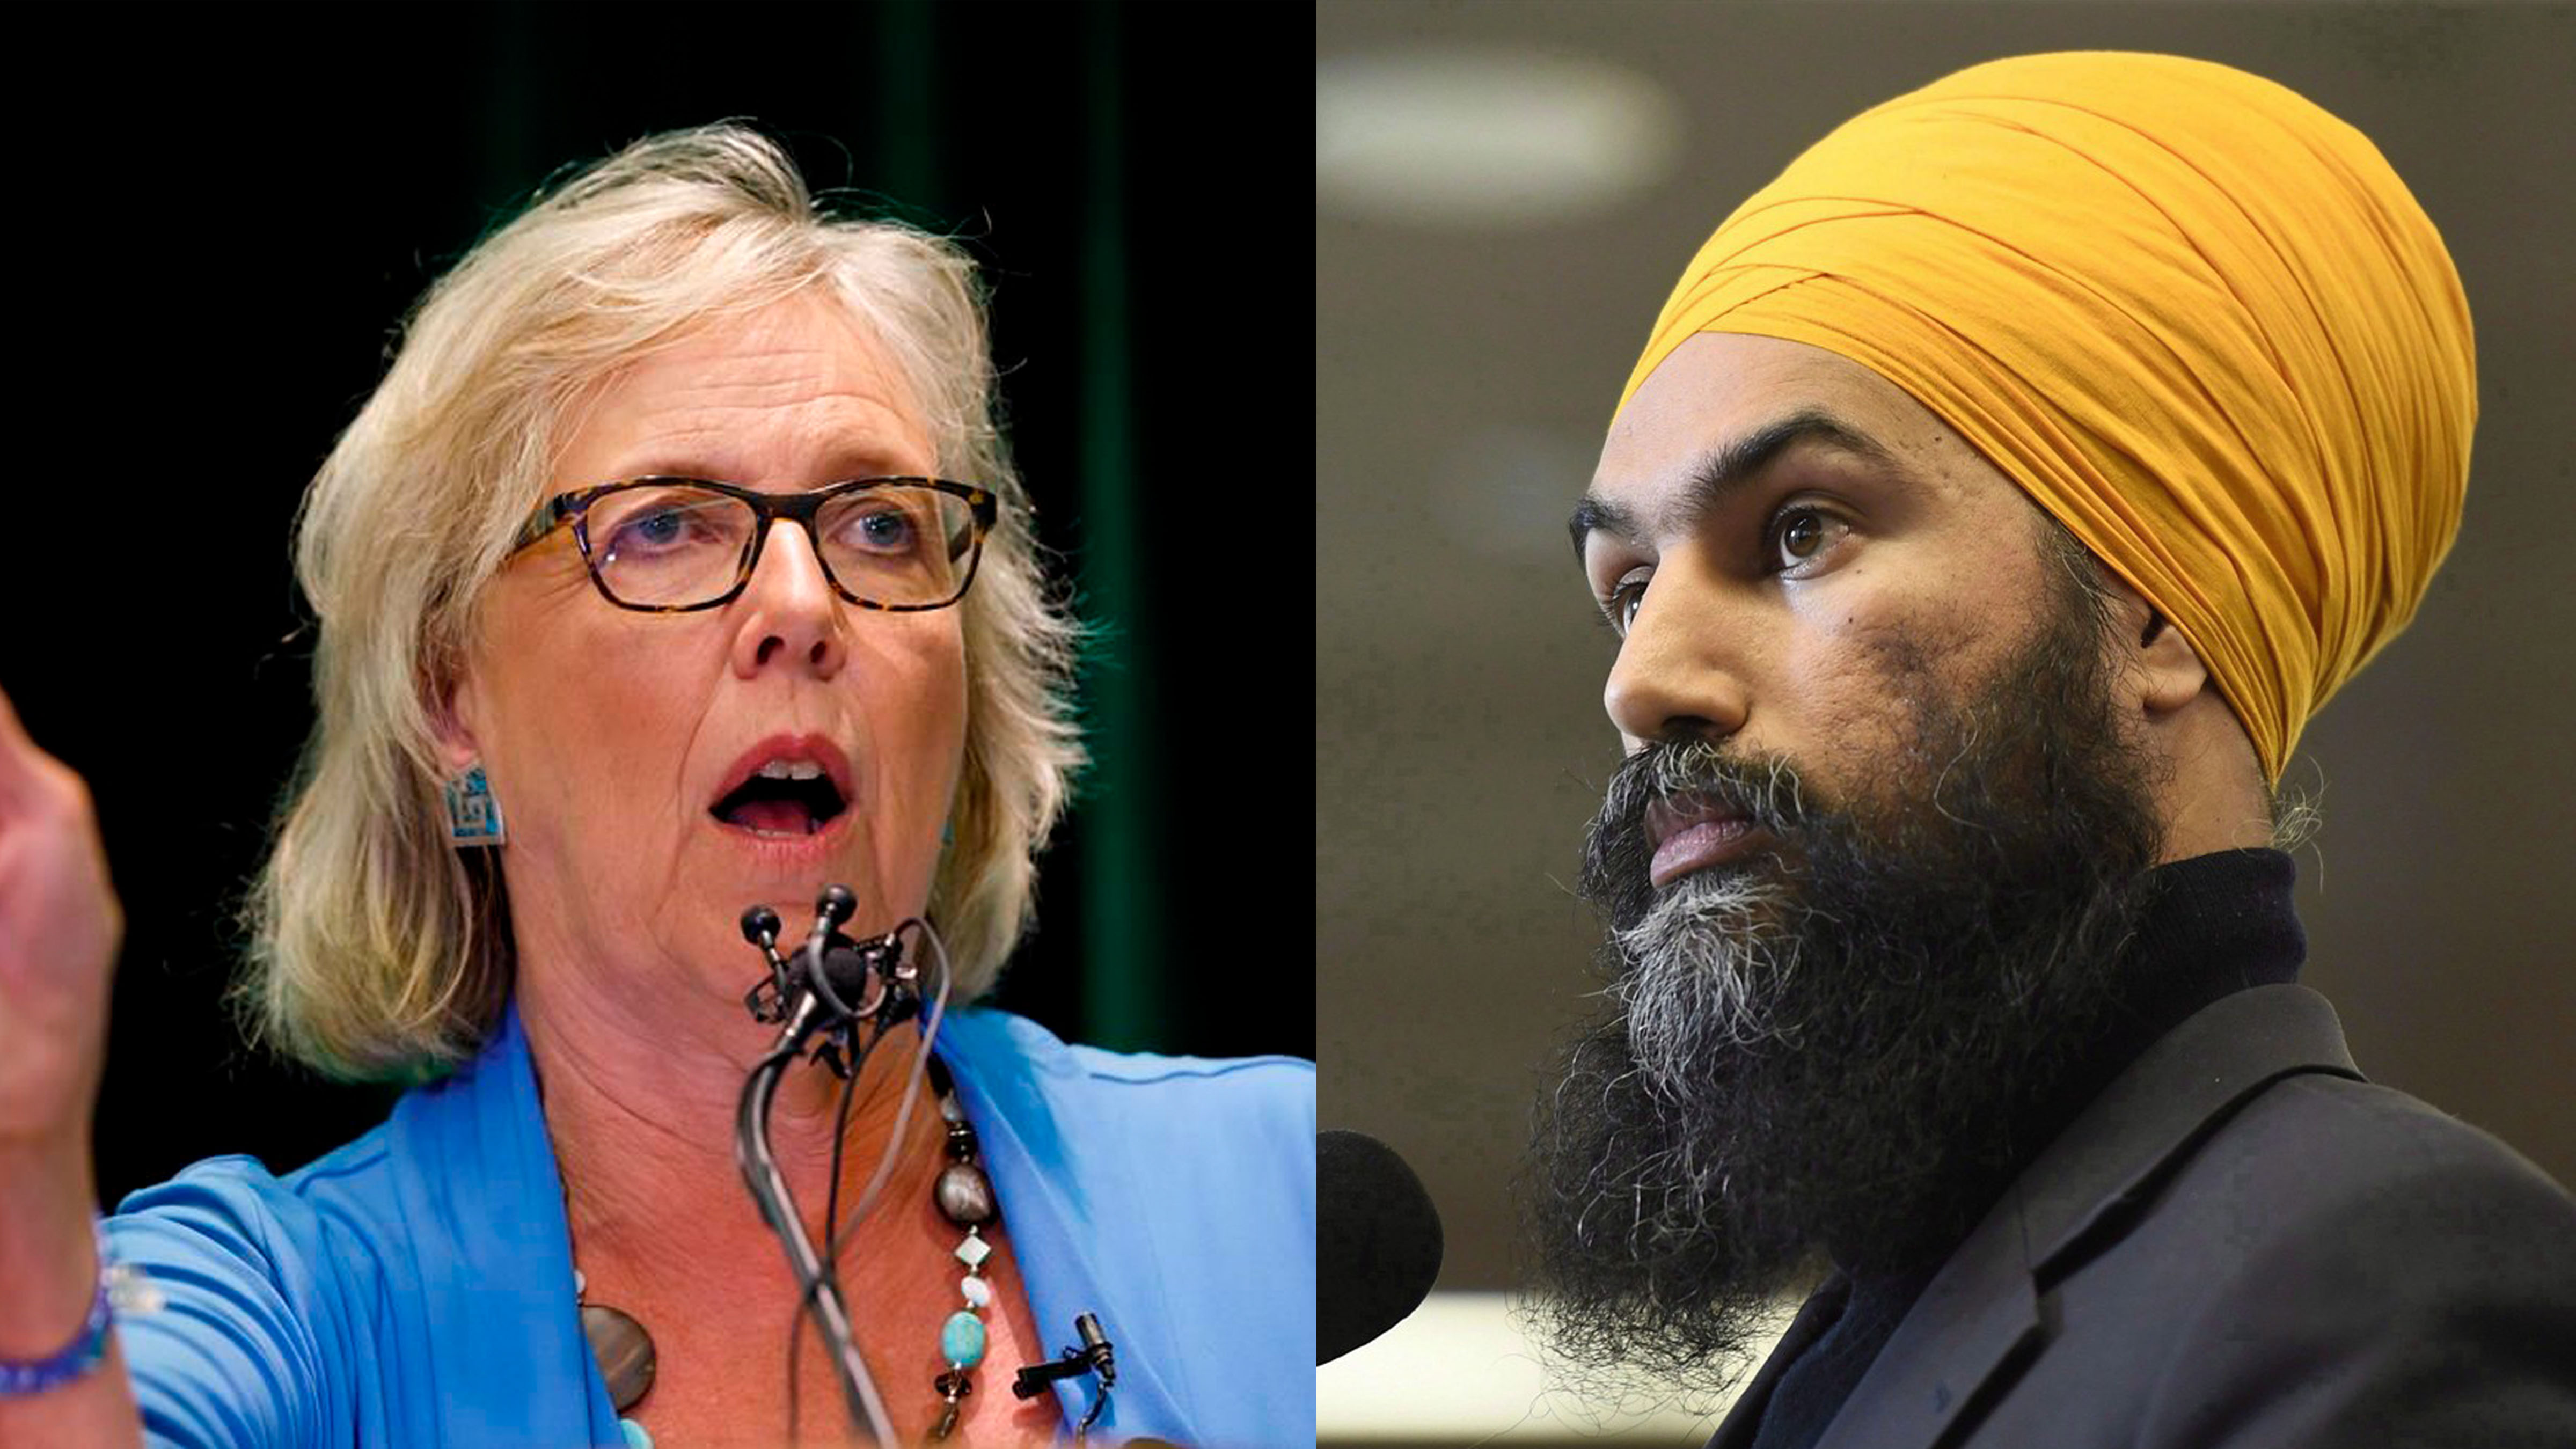 Prime Minister Trudeau dissolves Canada parliament